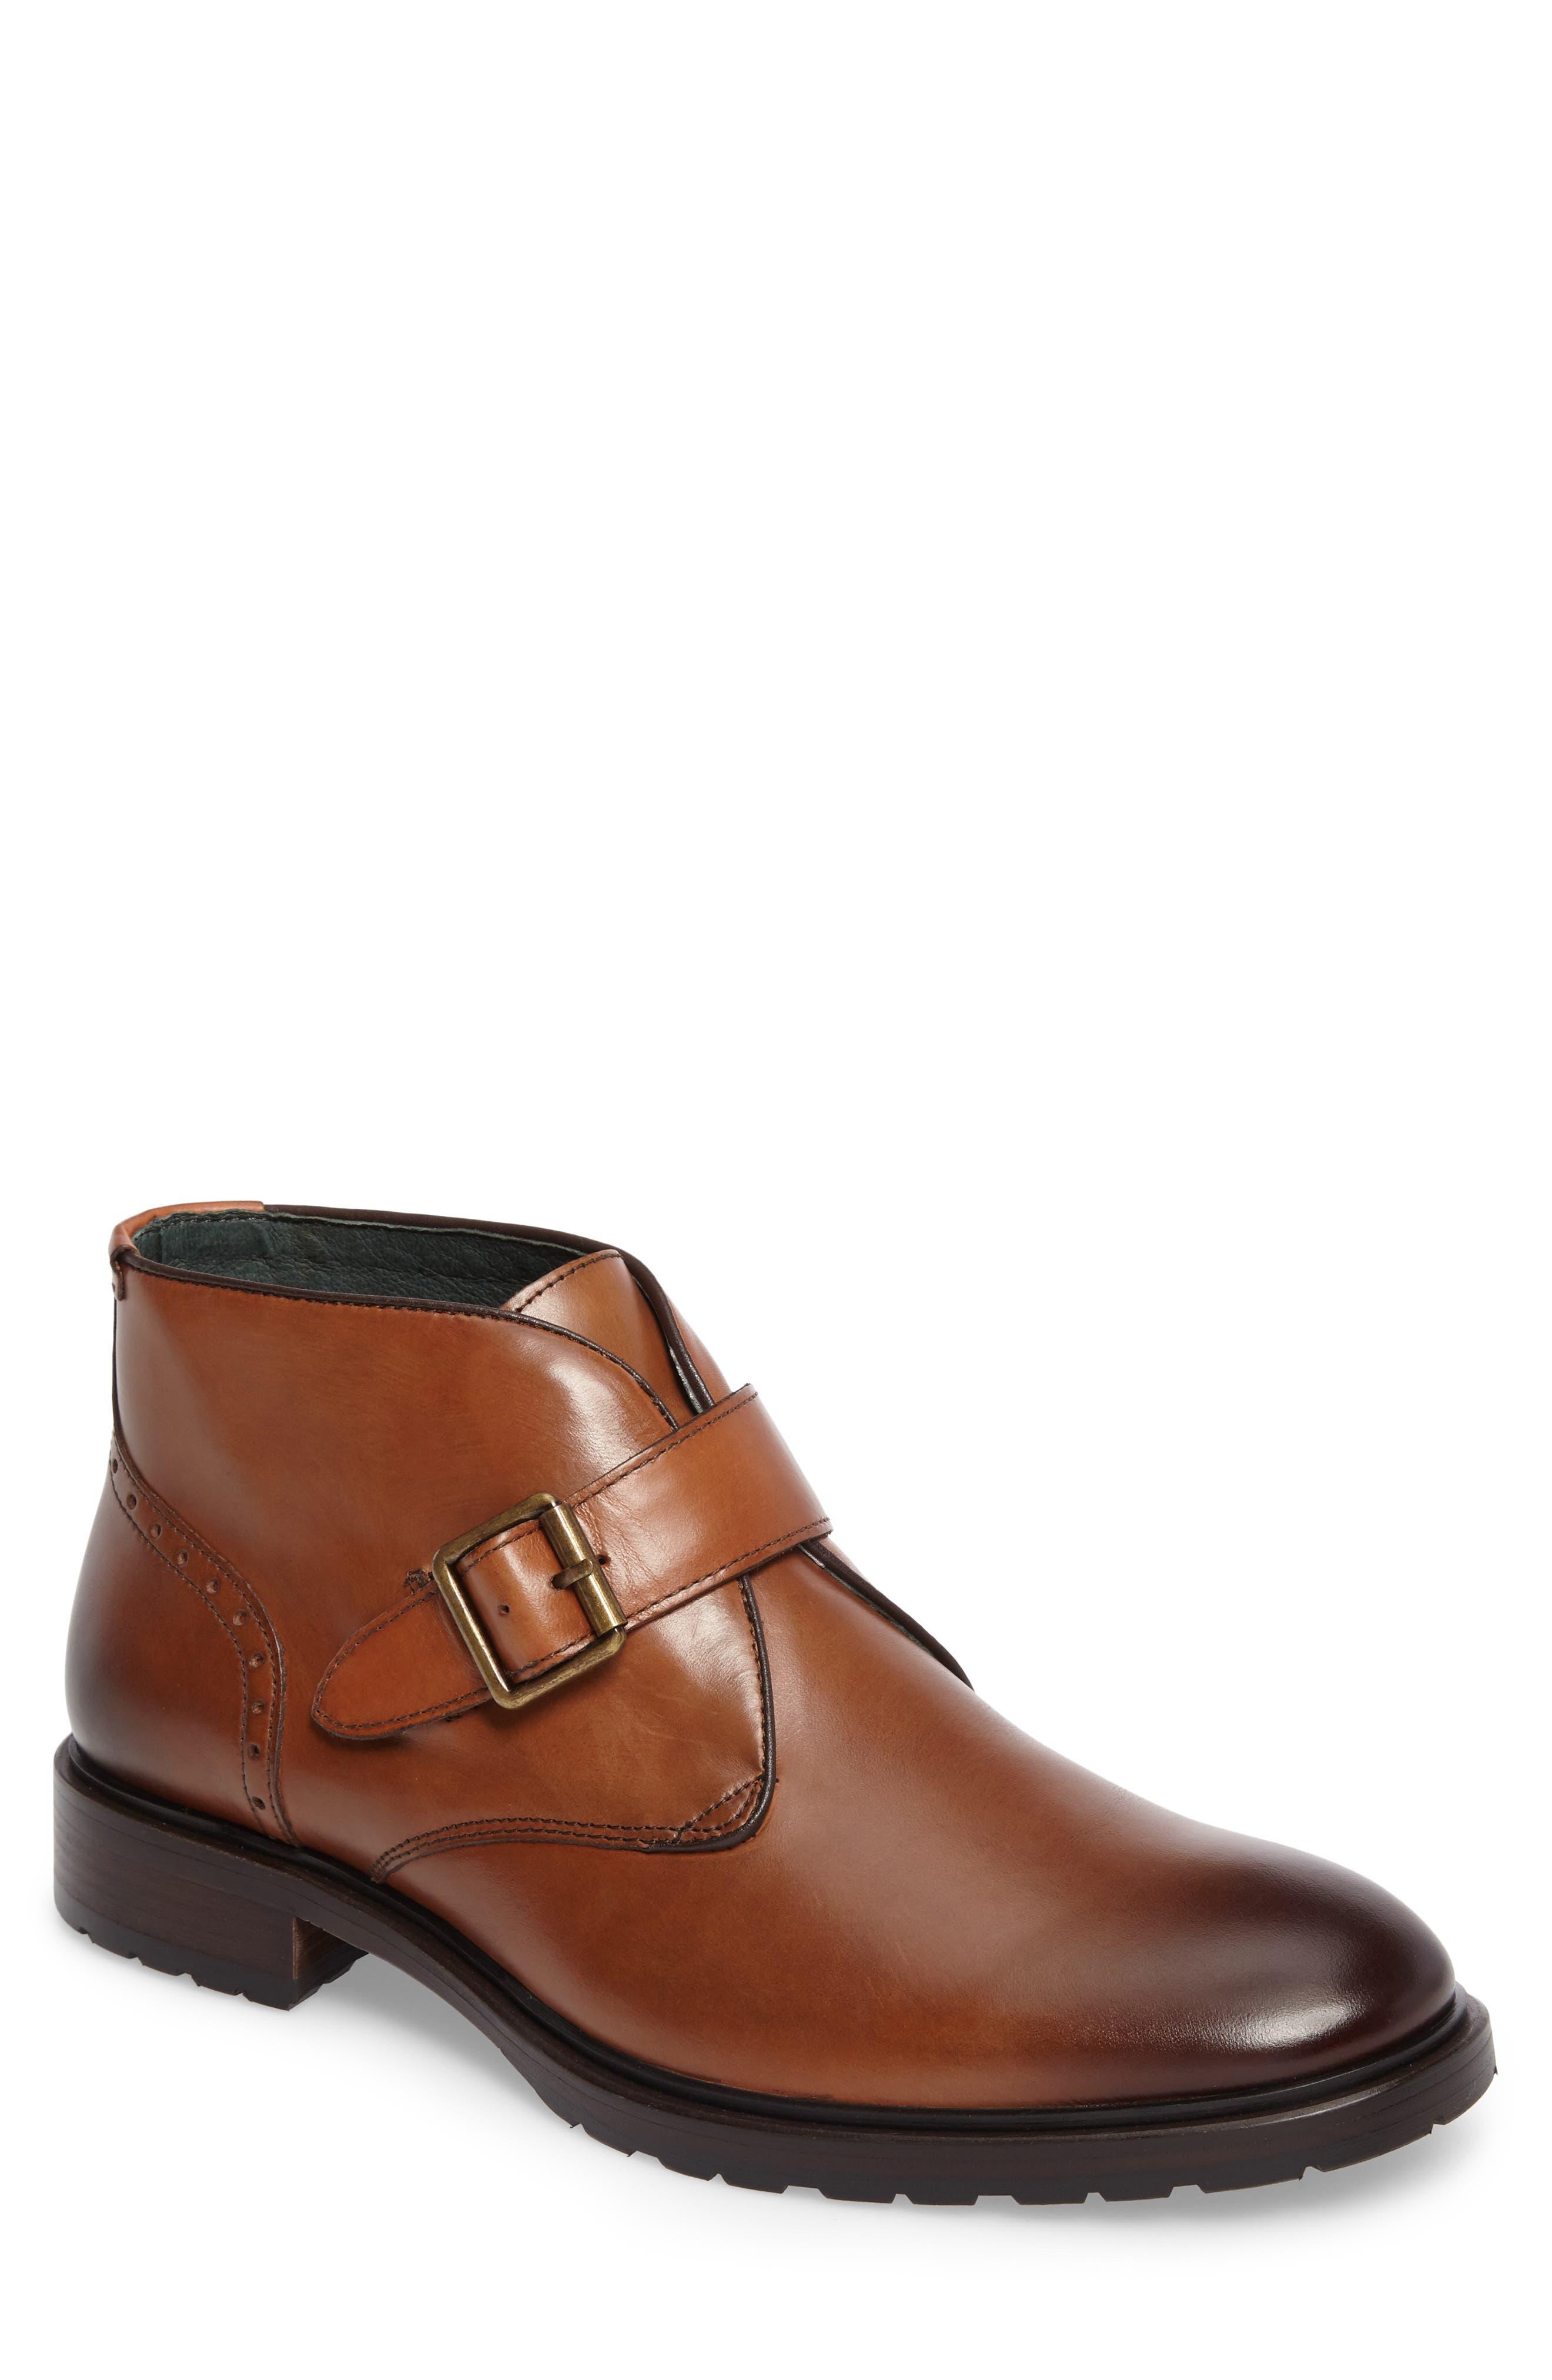 Alternate Image 1 Selected - J&M 1850 Myles Monk Strap Boot (Men)